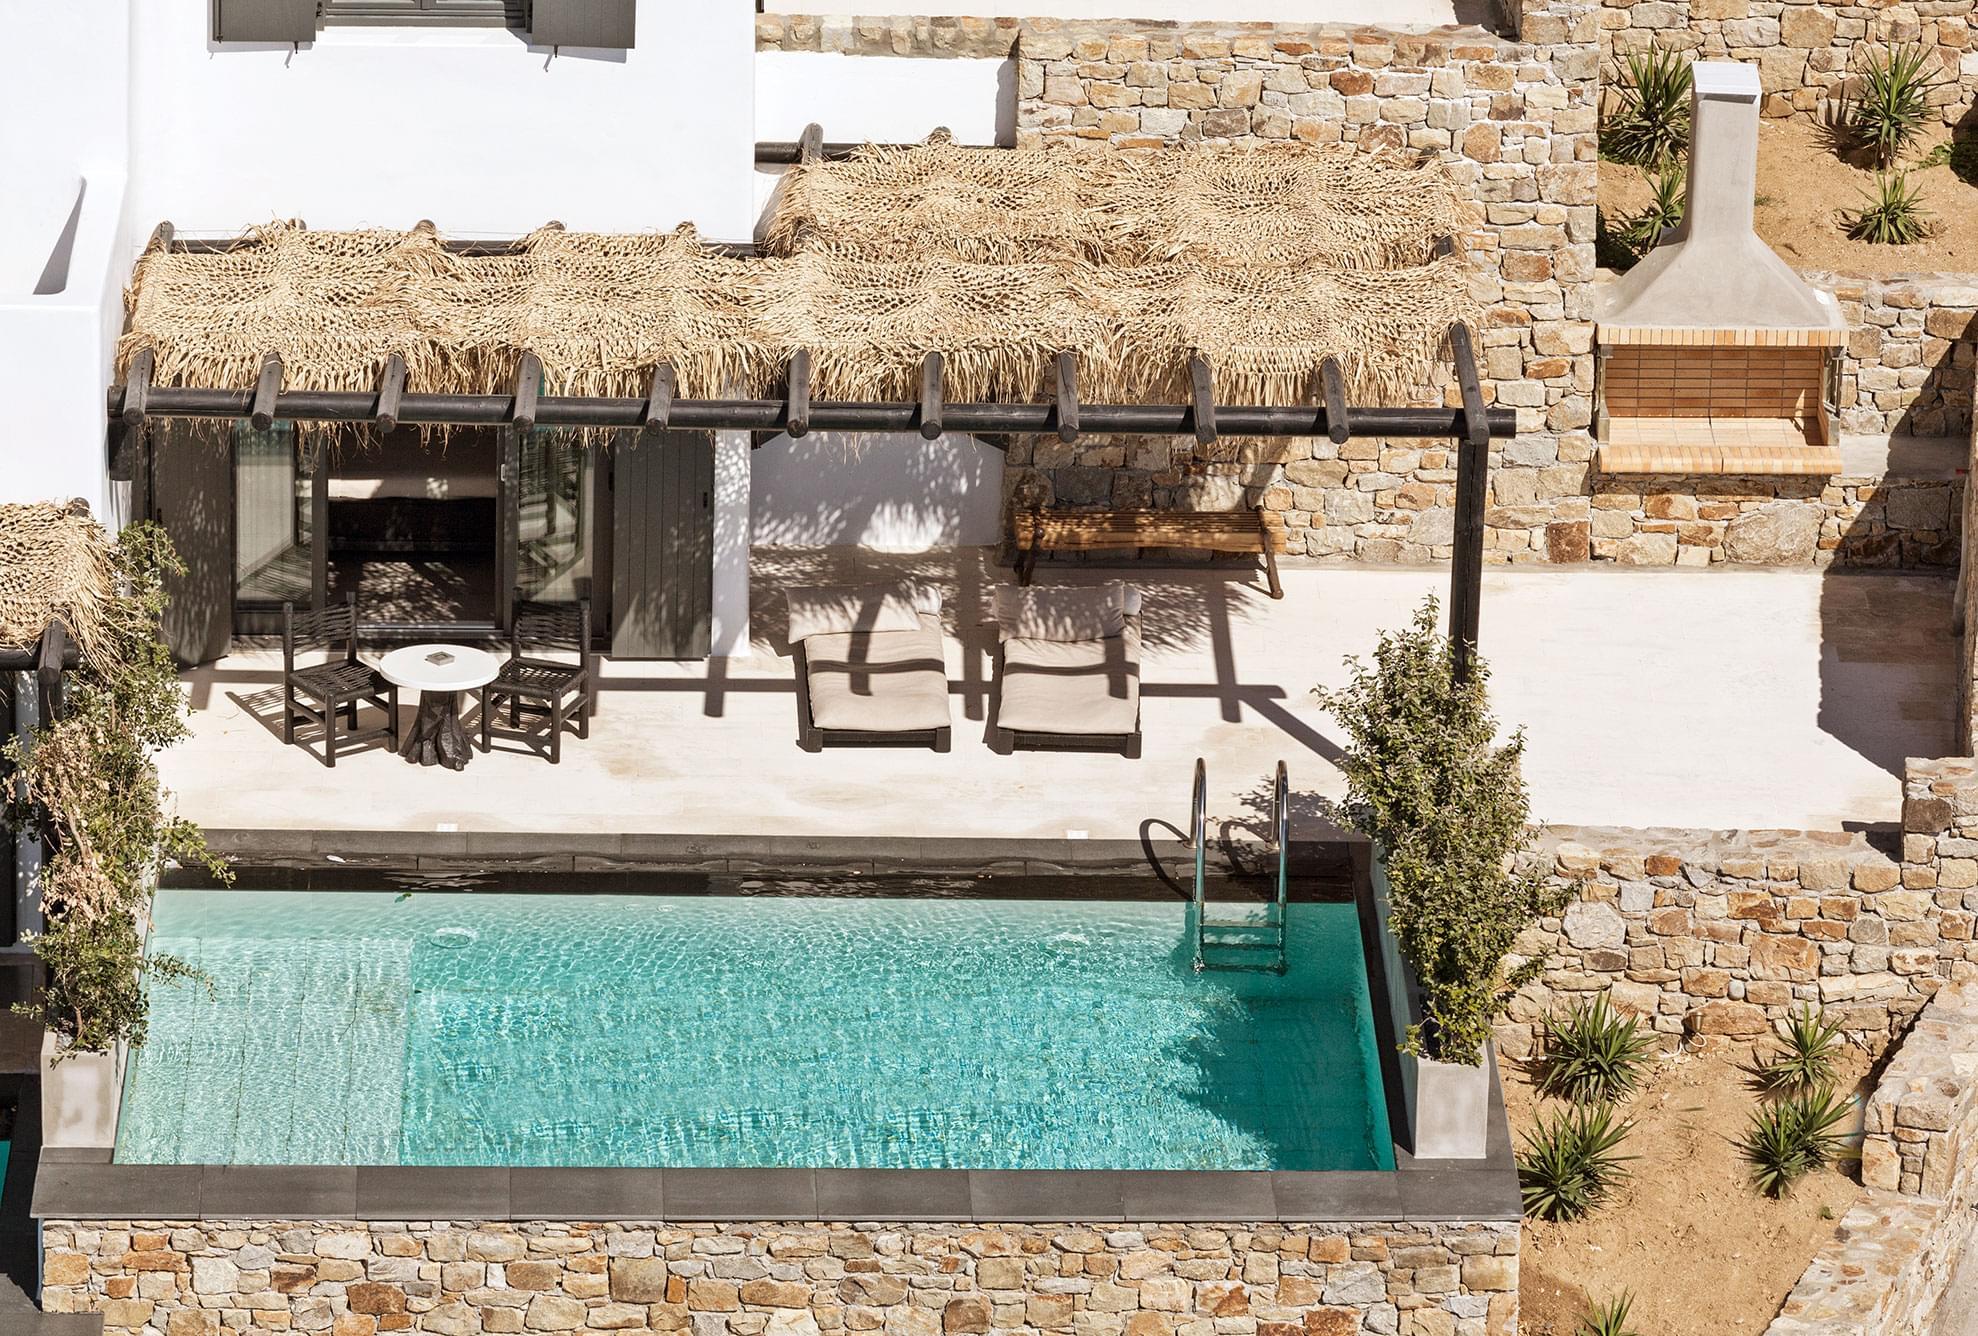 The Myconian Utopia swimming pool